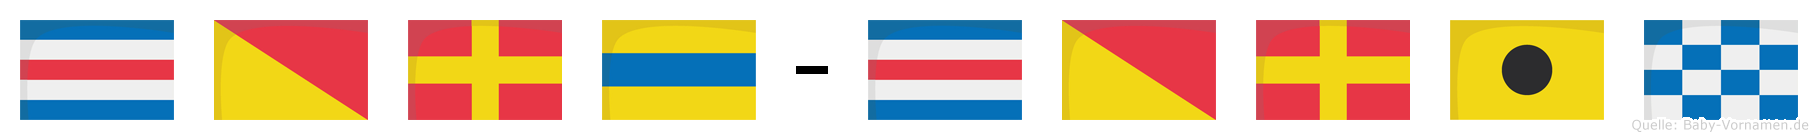 Cord-Corin im Flaggenalphabet